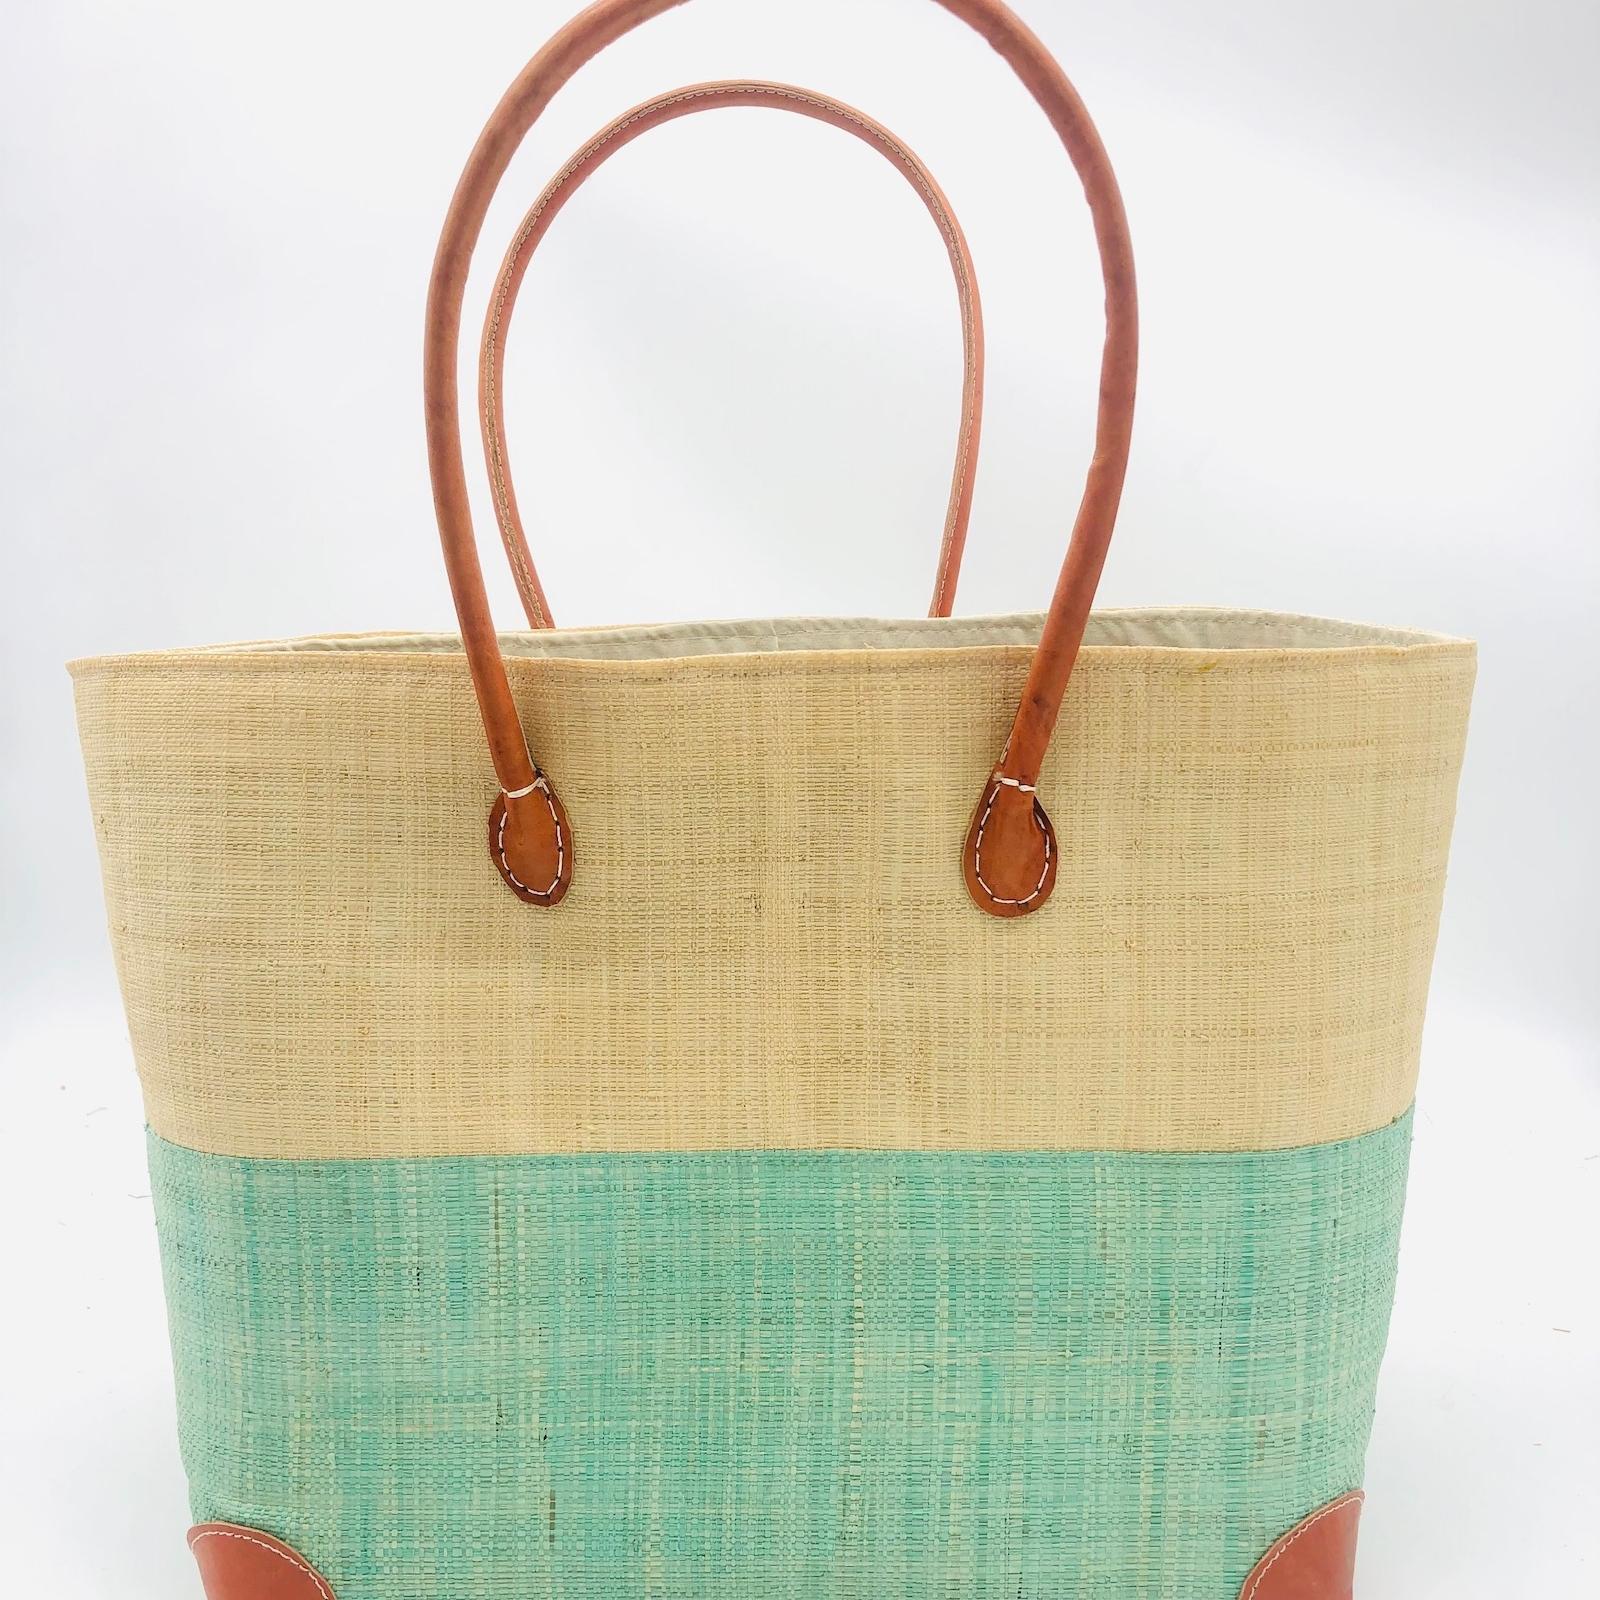 Trinidad Two Tone Straw Basket - ClearWater | Trada Marketplace